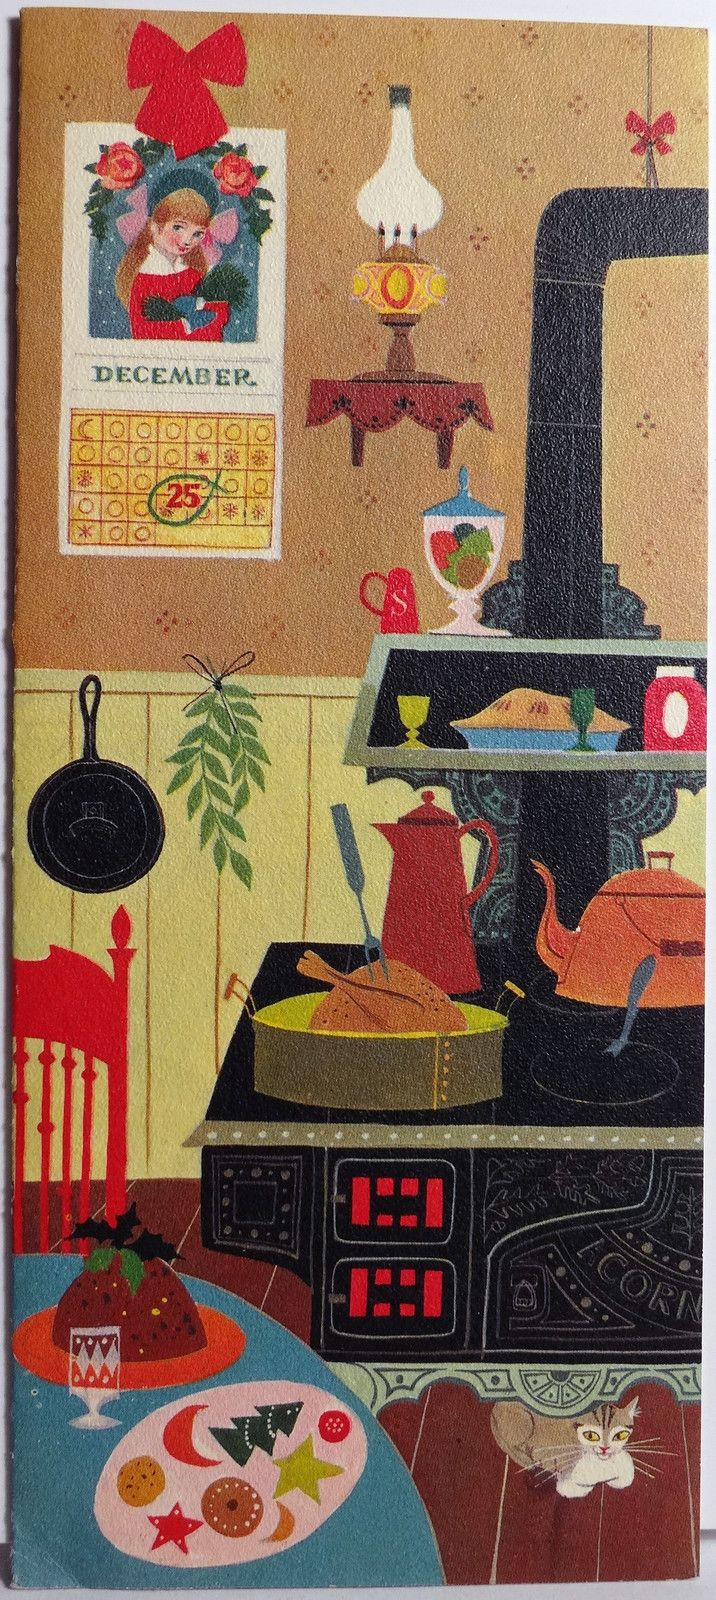 Hallmark Quaint Country Kitchen vintage Christmas card.